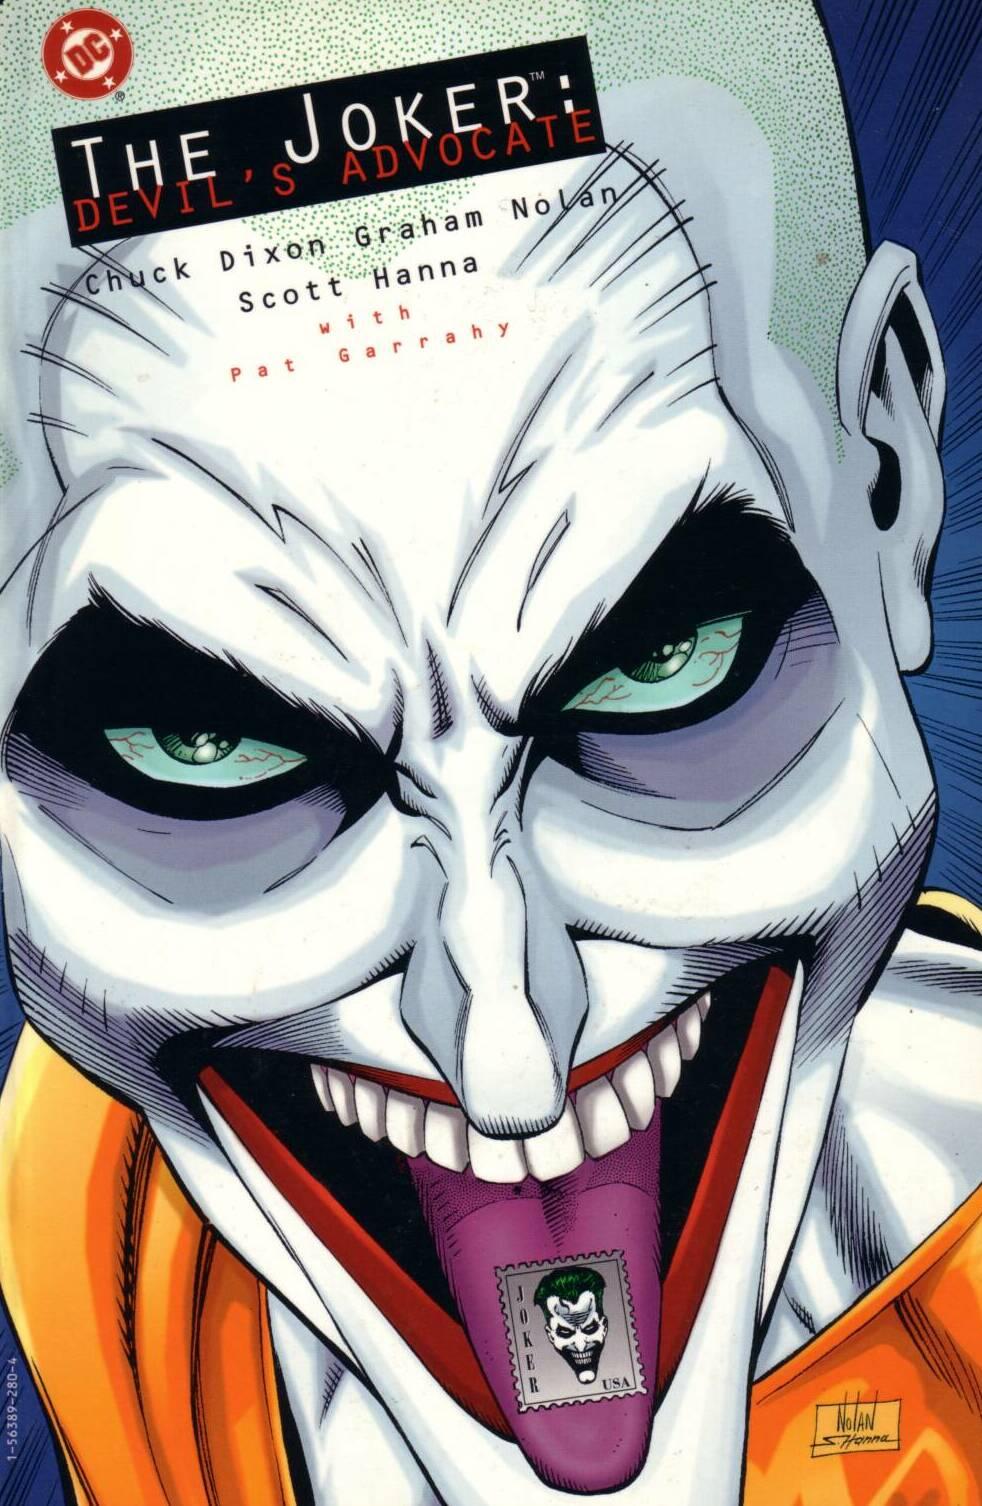 Joker: Devil's Advocate